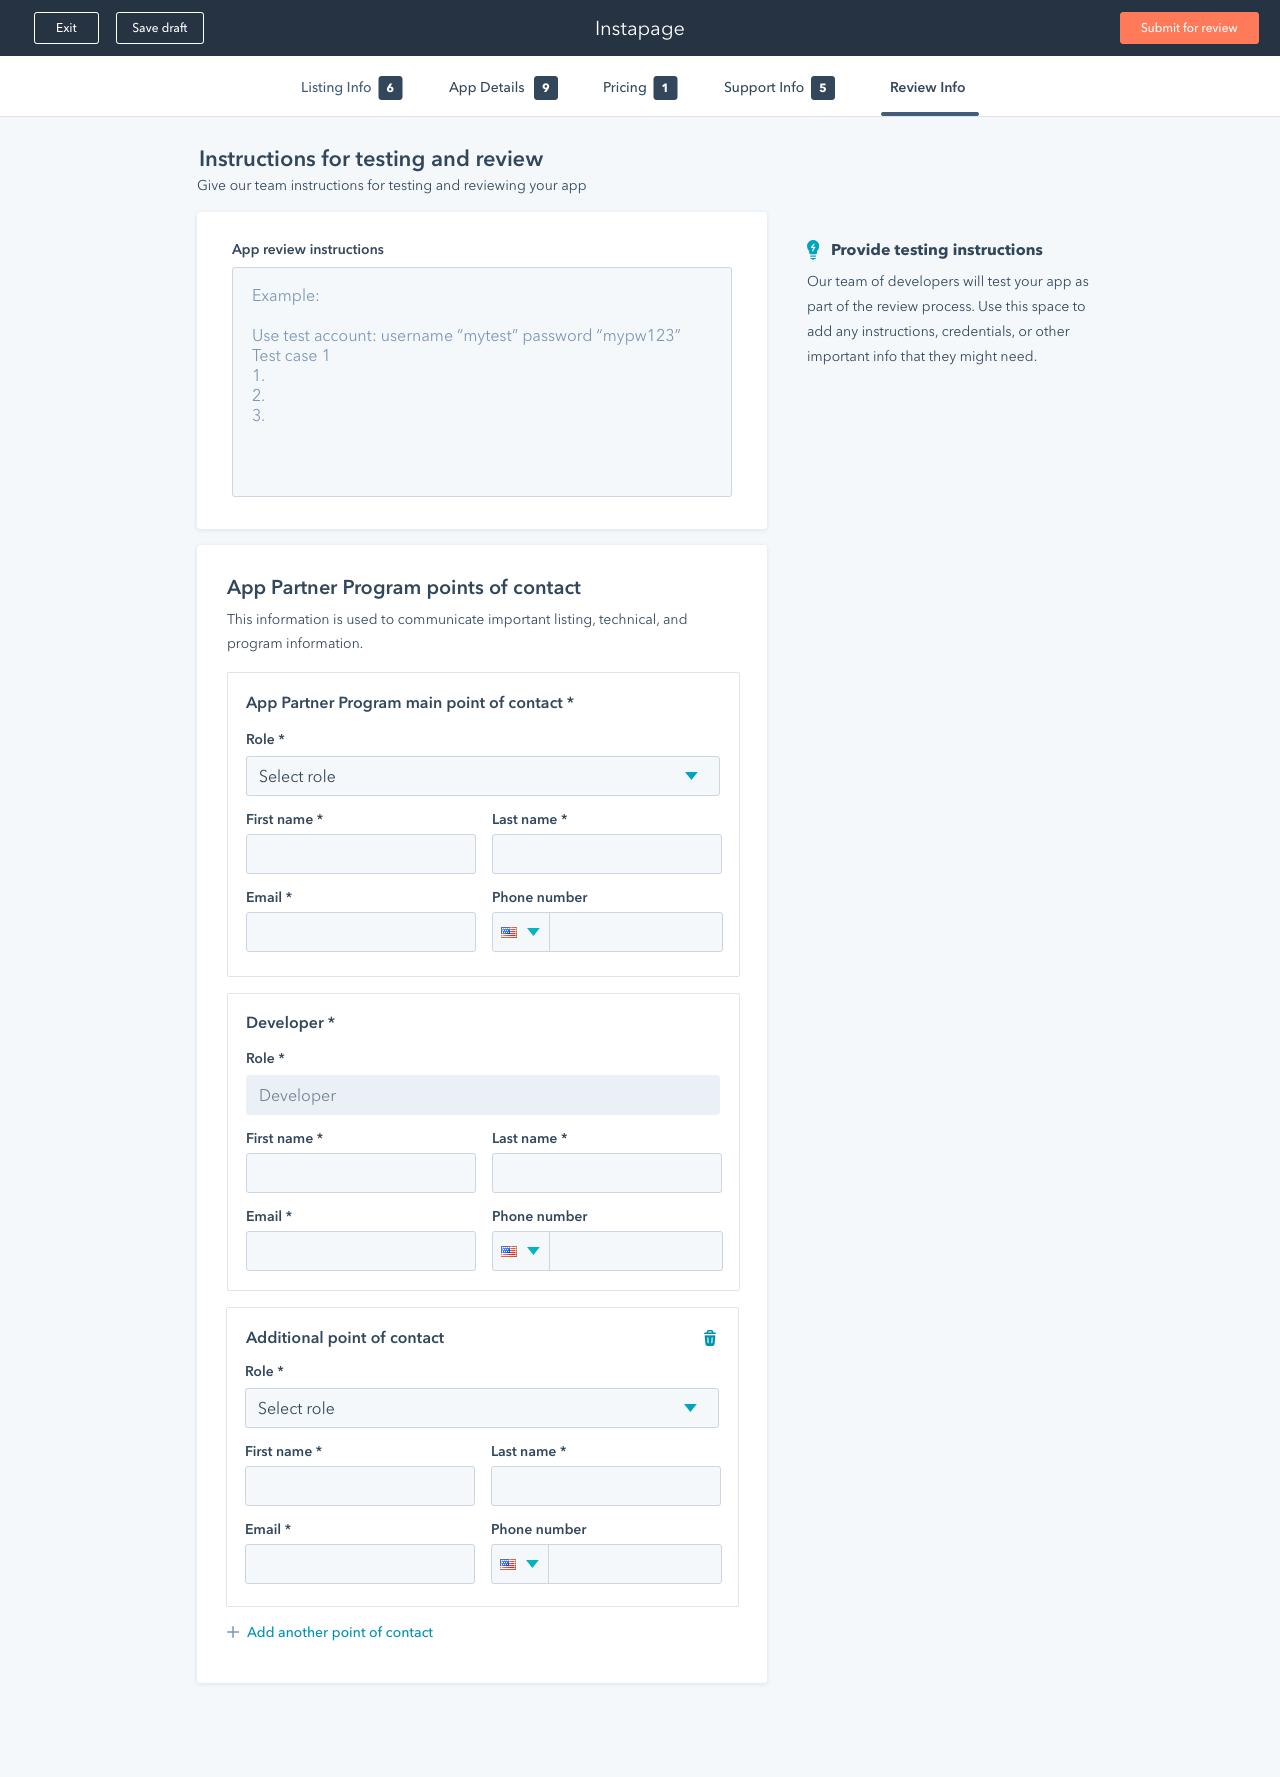 app_partner_contacts